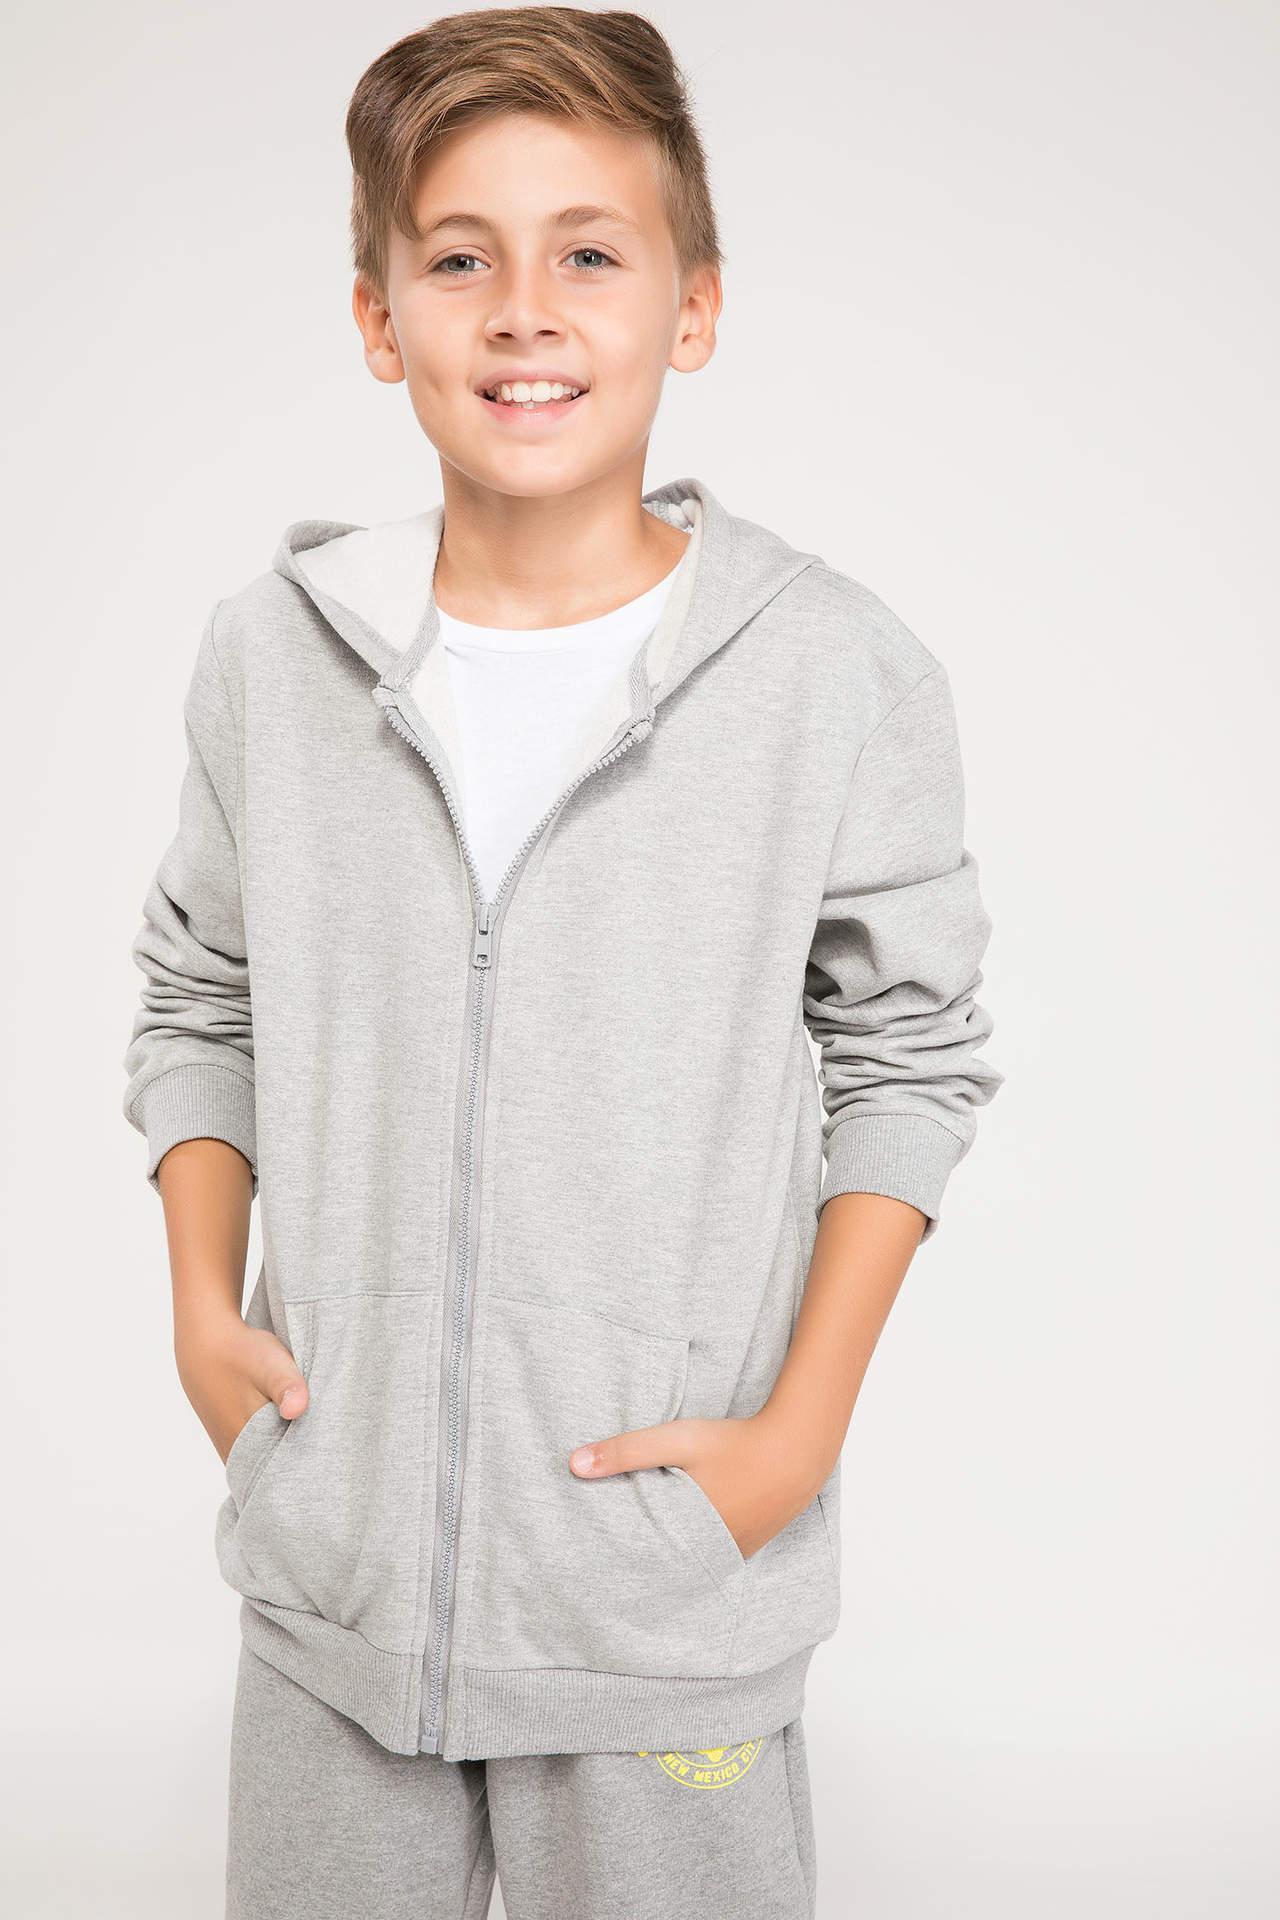 DeFacto Erkek Çocuk Kapüşonlu Sweatshirt Gri male